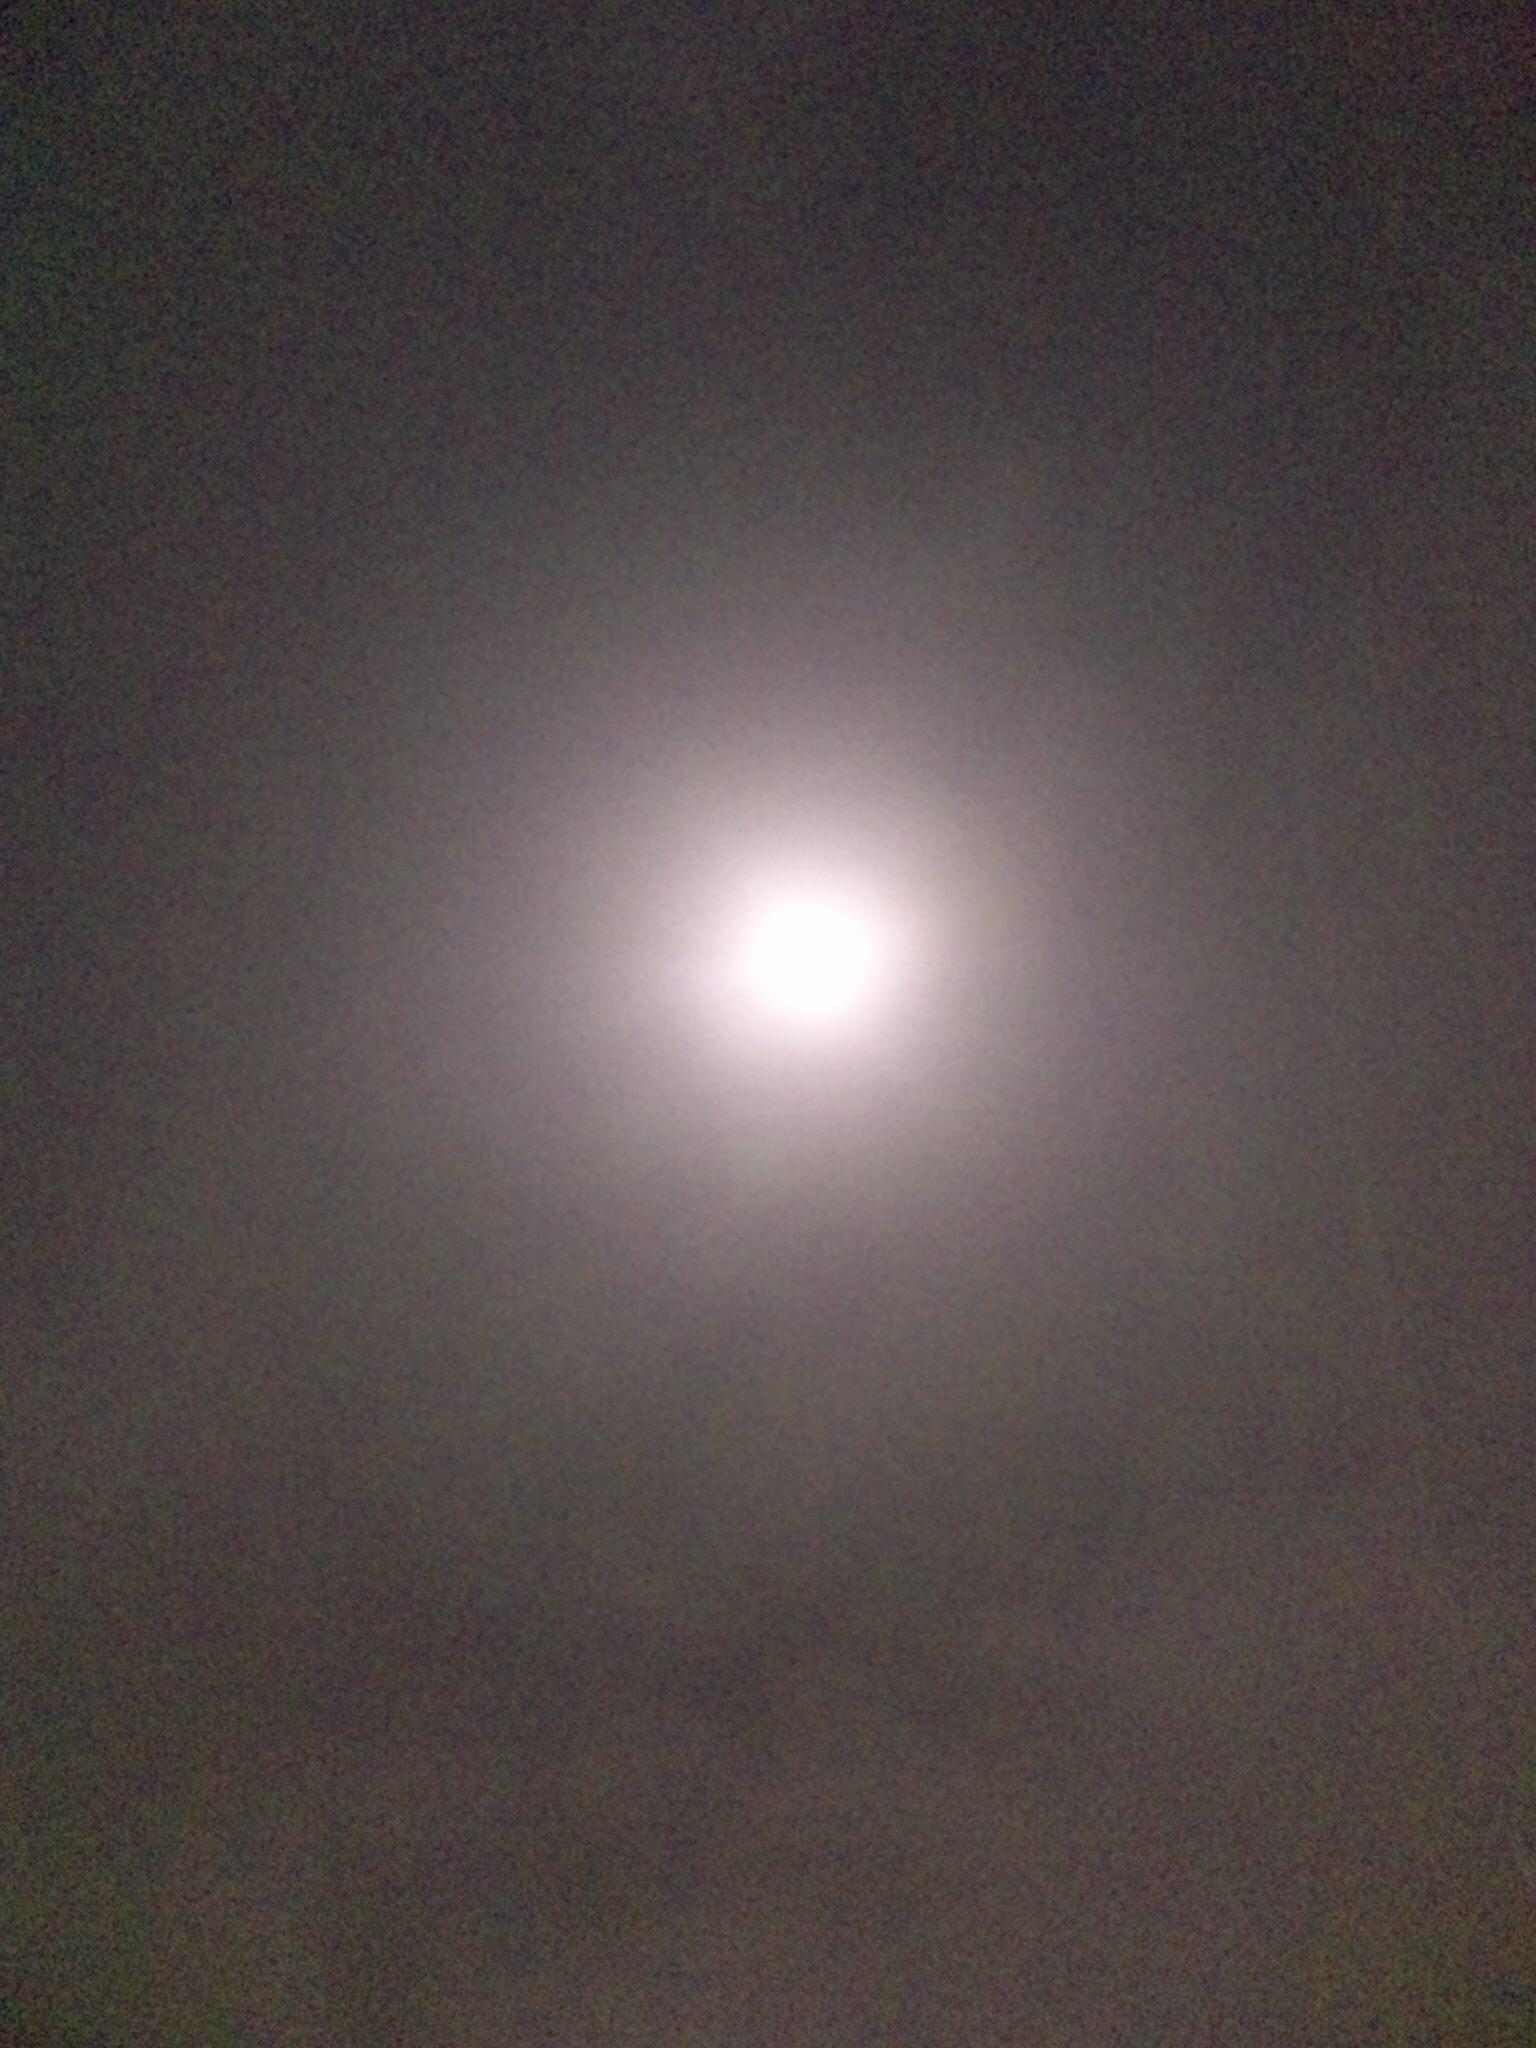 2010 full moon 2